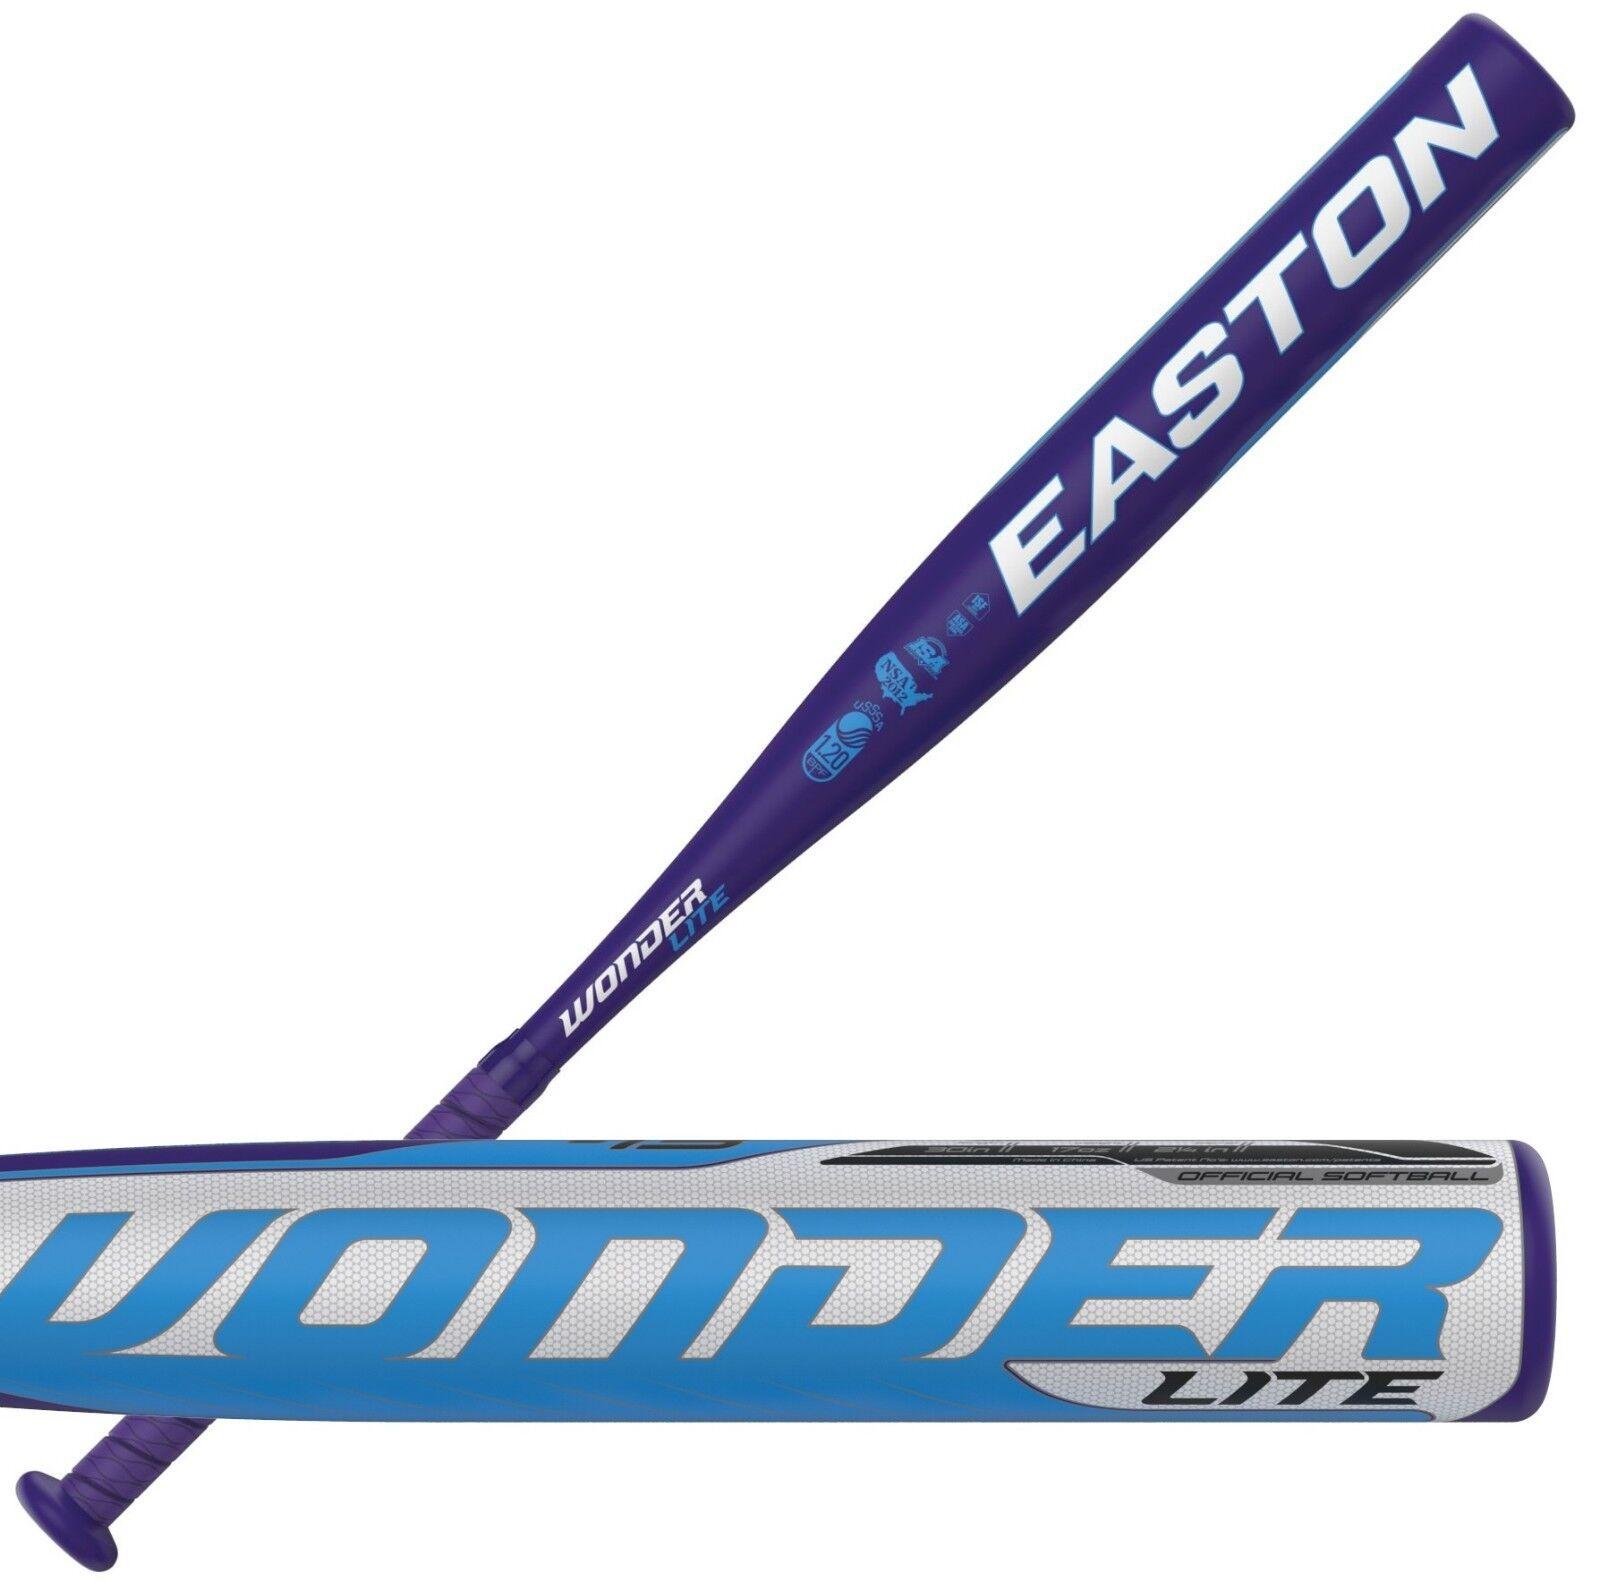 2019 Easton wonderlite -13 31  18 OZ Para Mujer Fastpitch Softball Bat FP19WL13